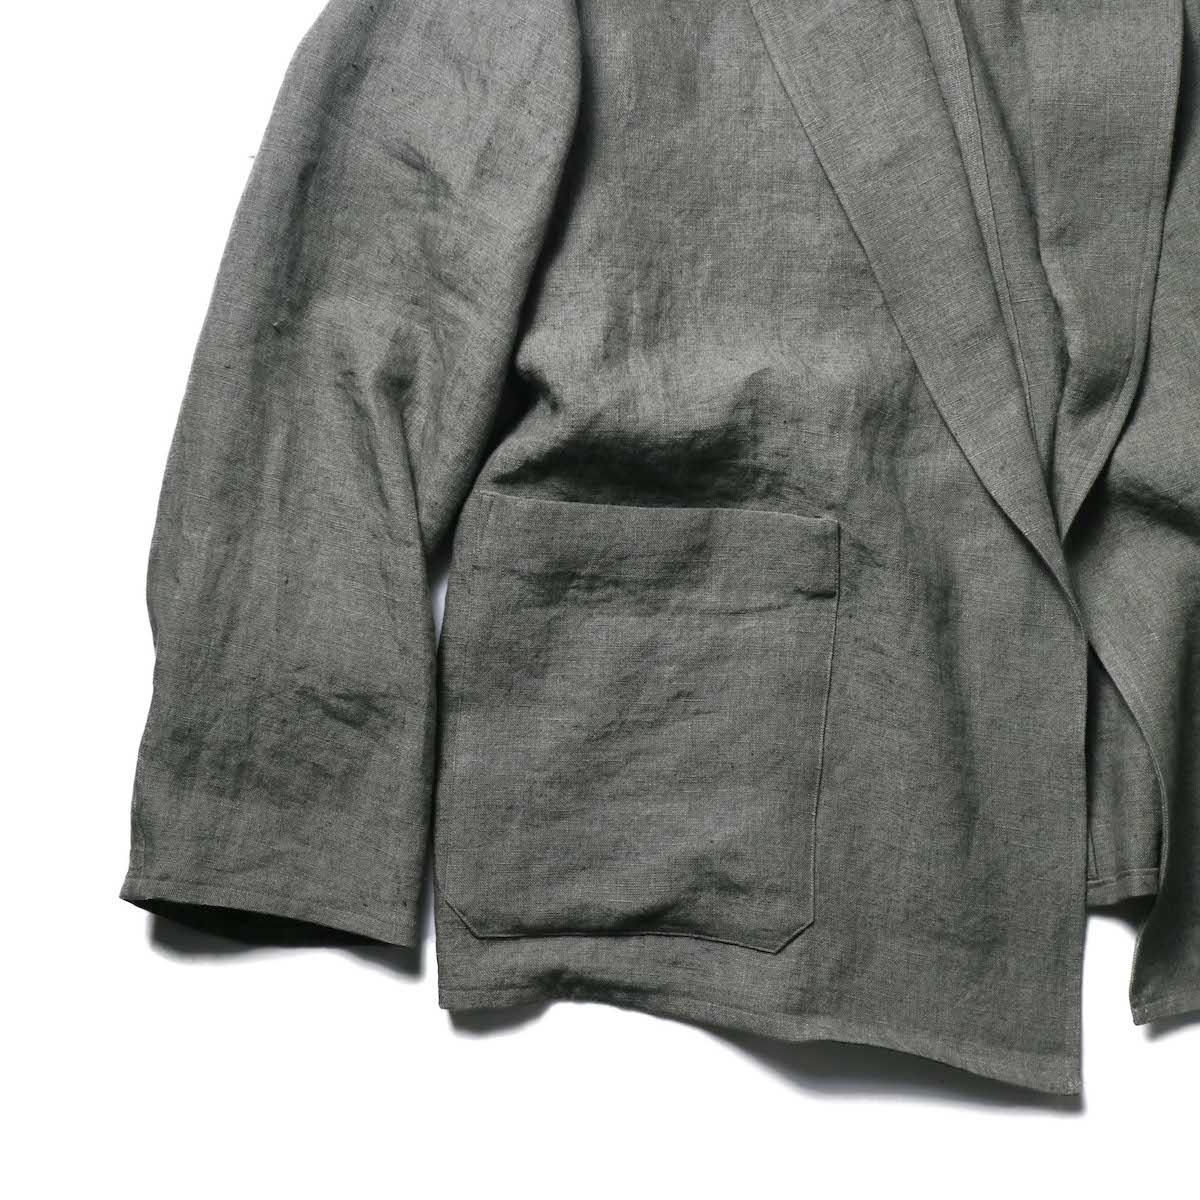 blurhms / Wash Linen Cardigan Jacket (KhakiGrey)ポケット